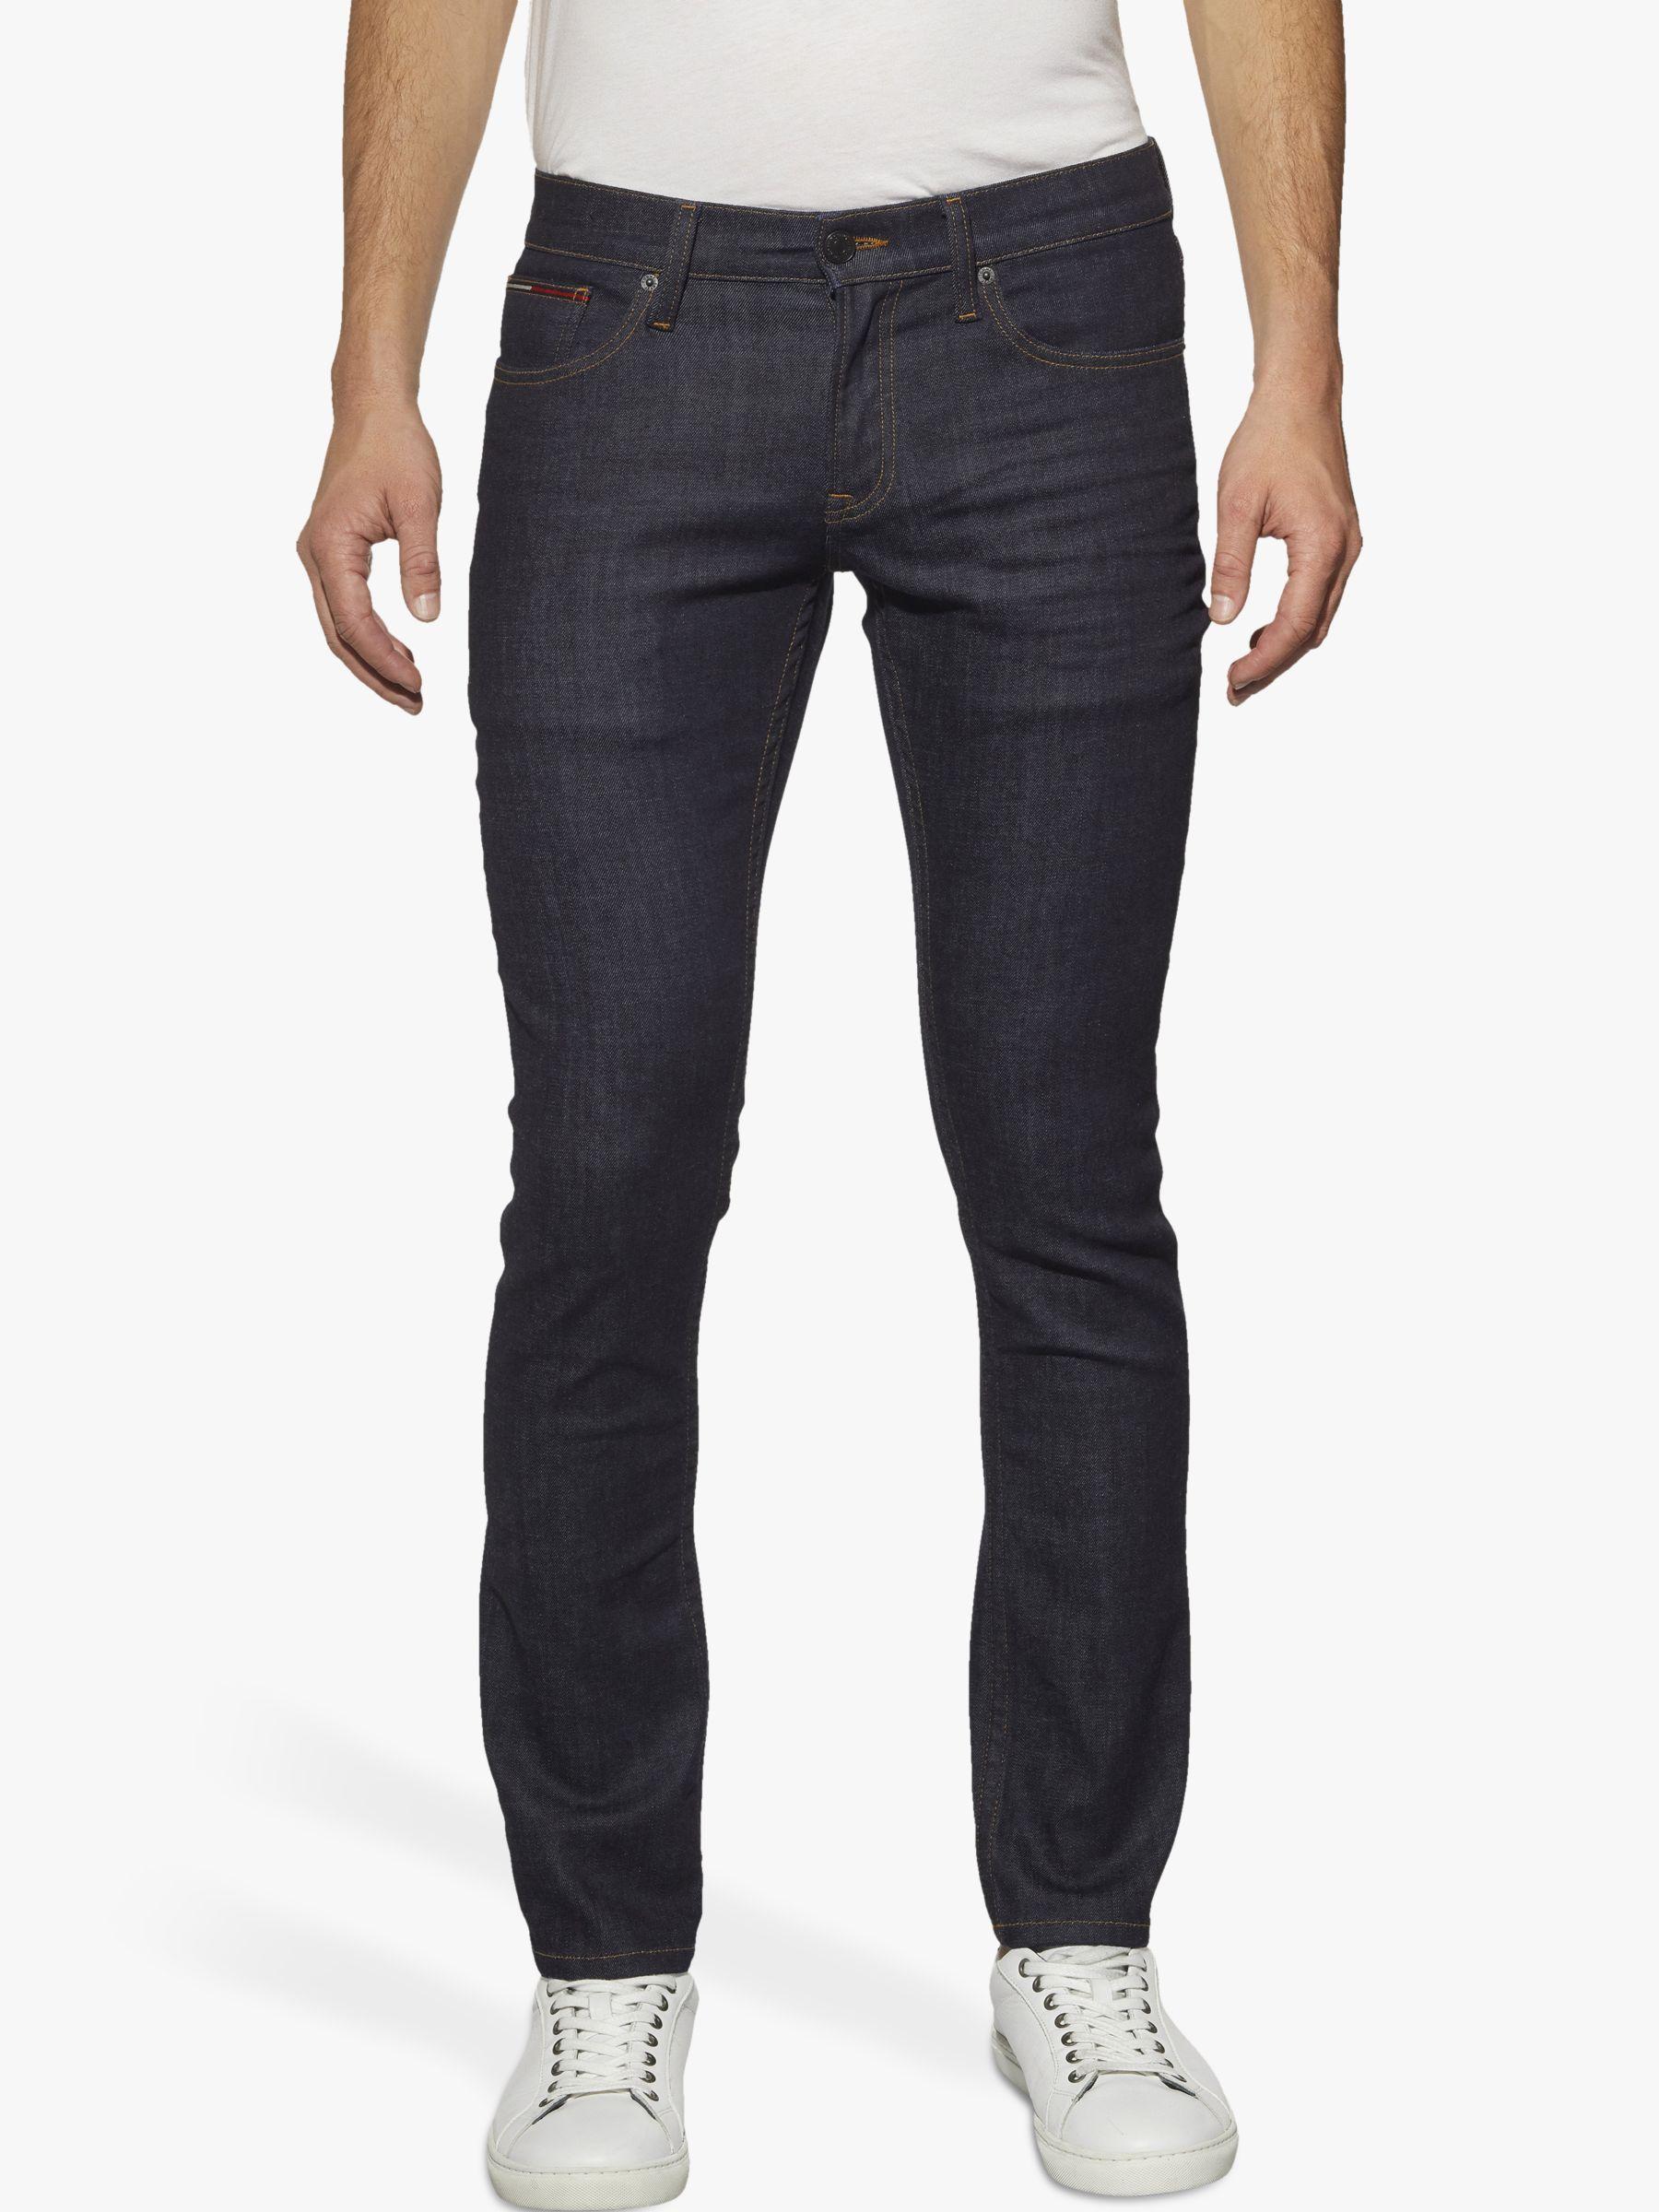 Tommy Jeans Men/'s Slim Scanton Jeans Blue